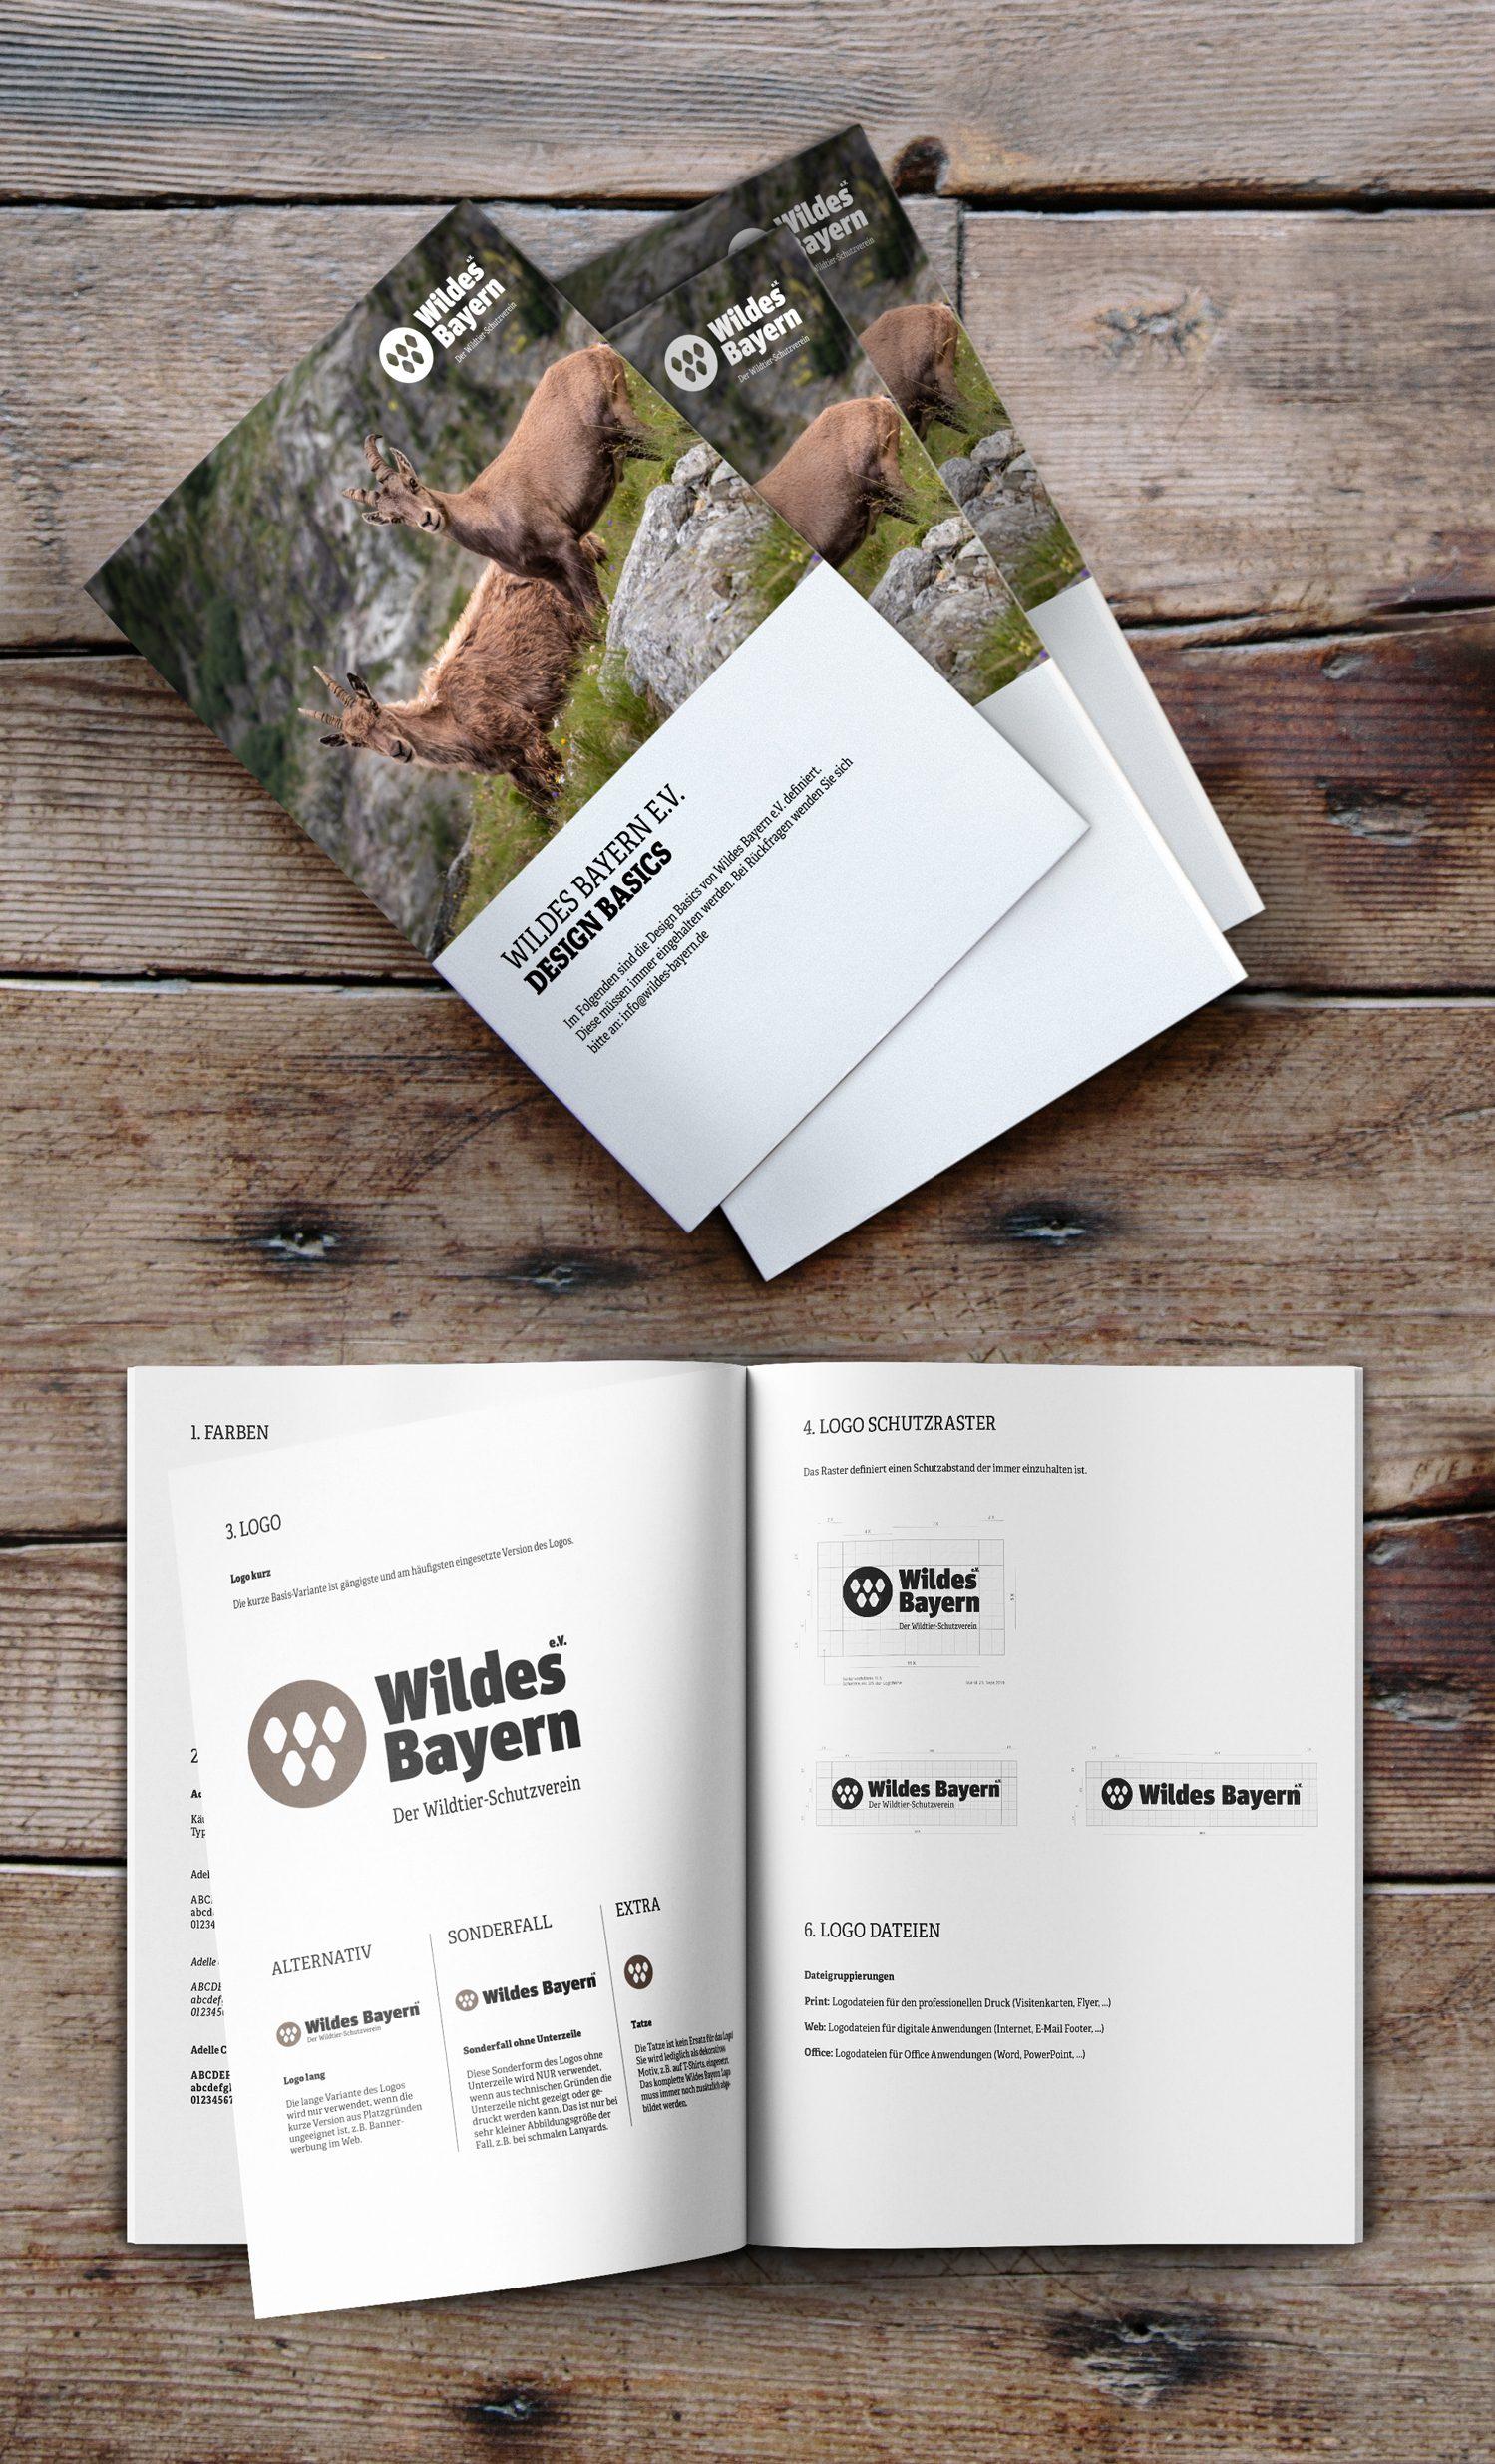 Wildes Bayern Design Basics